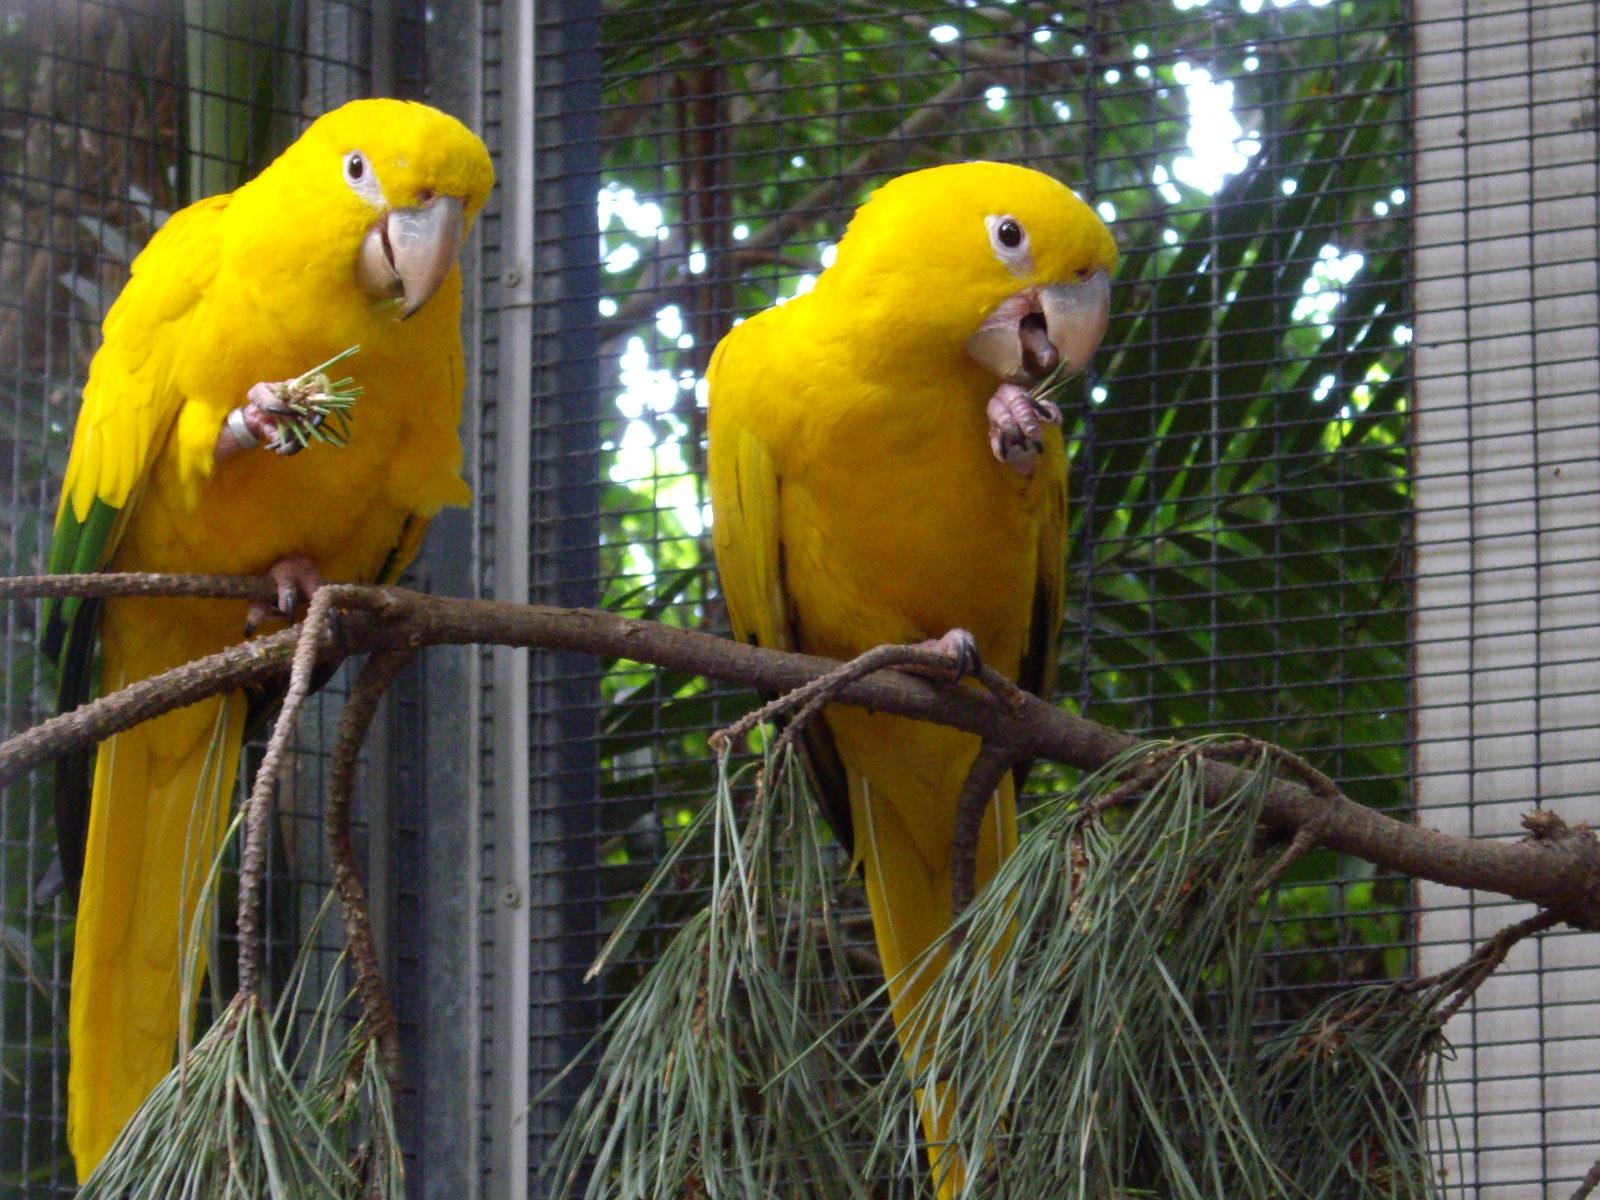 Adult golden conures